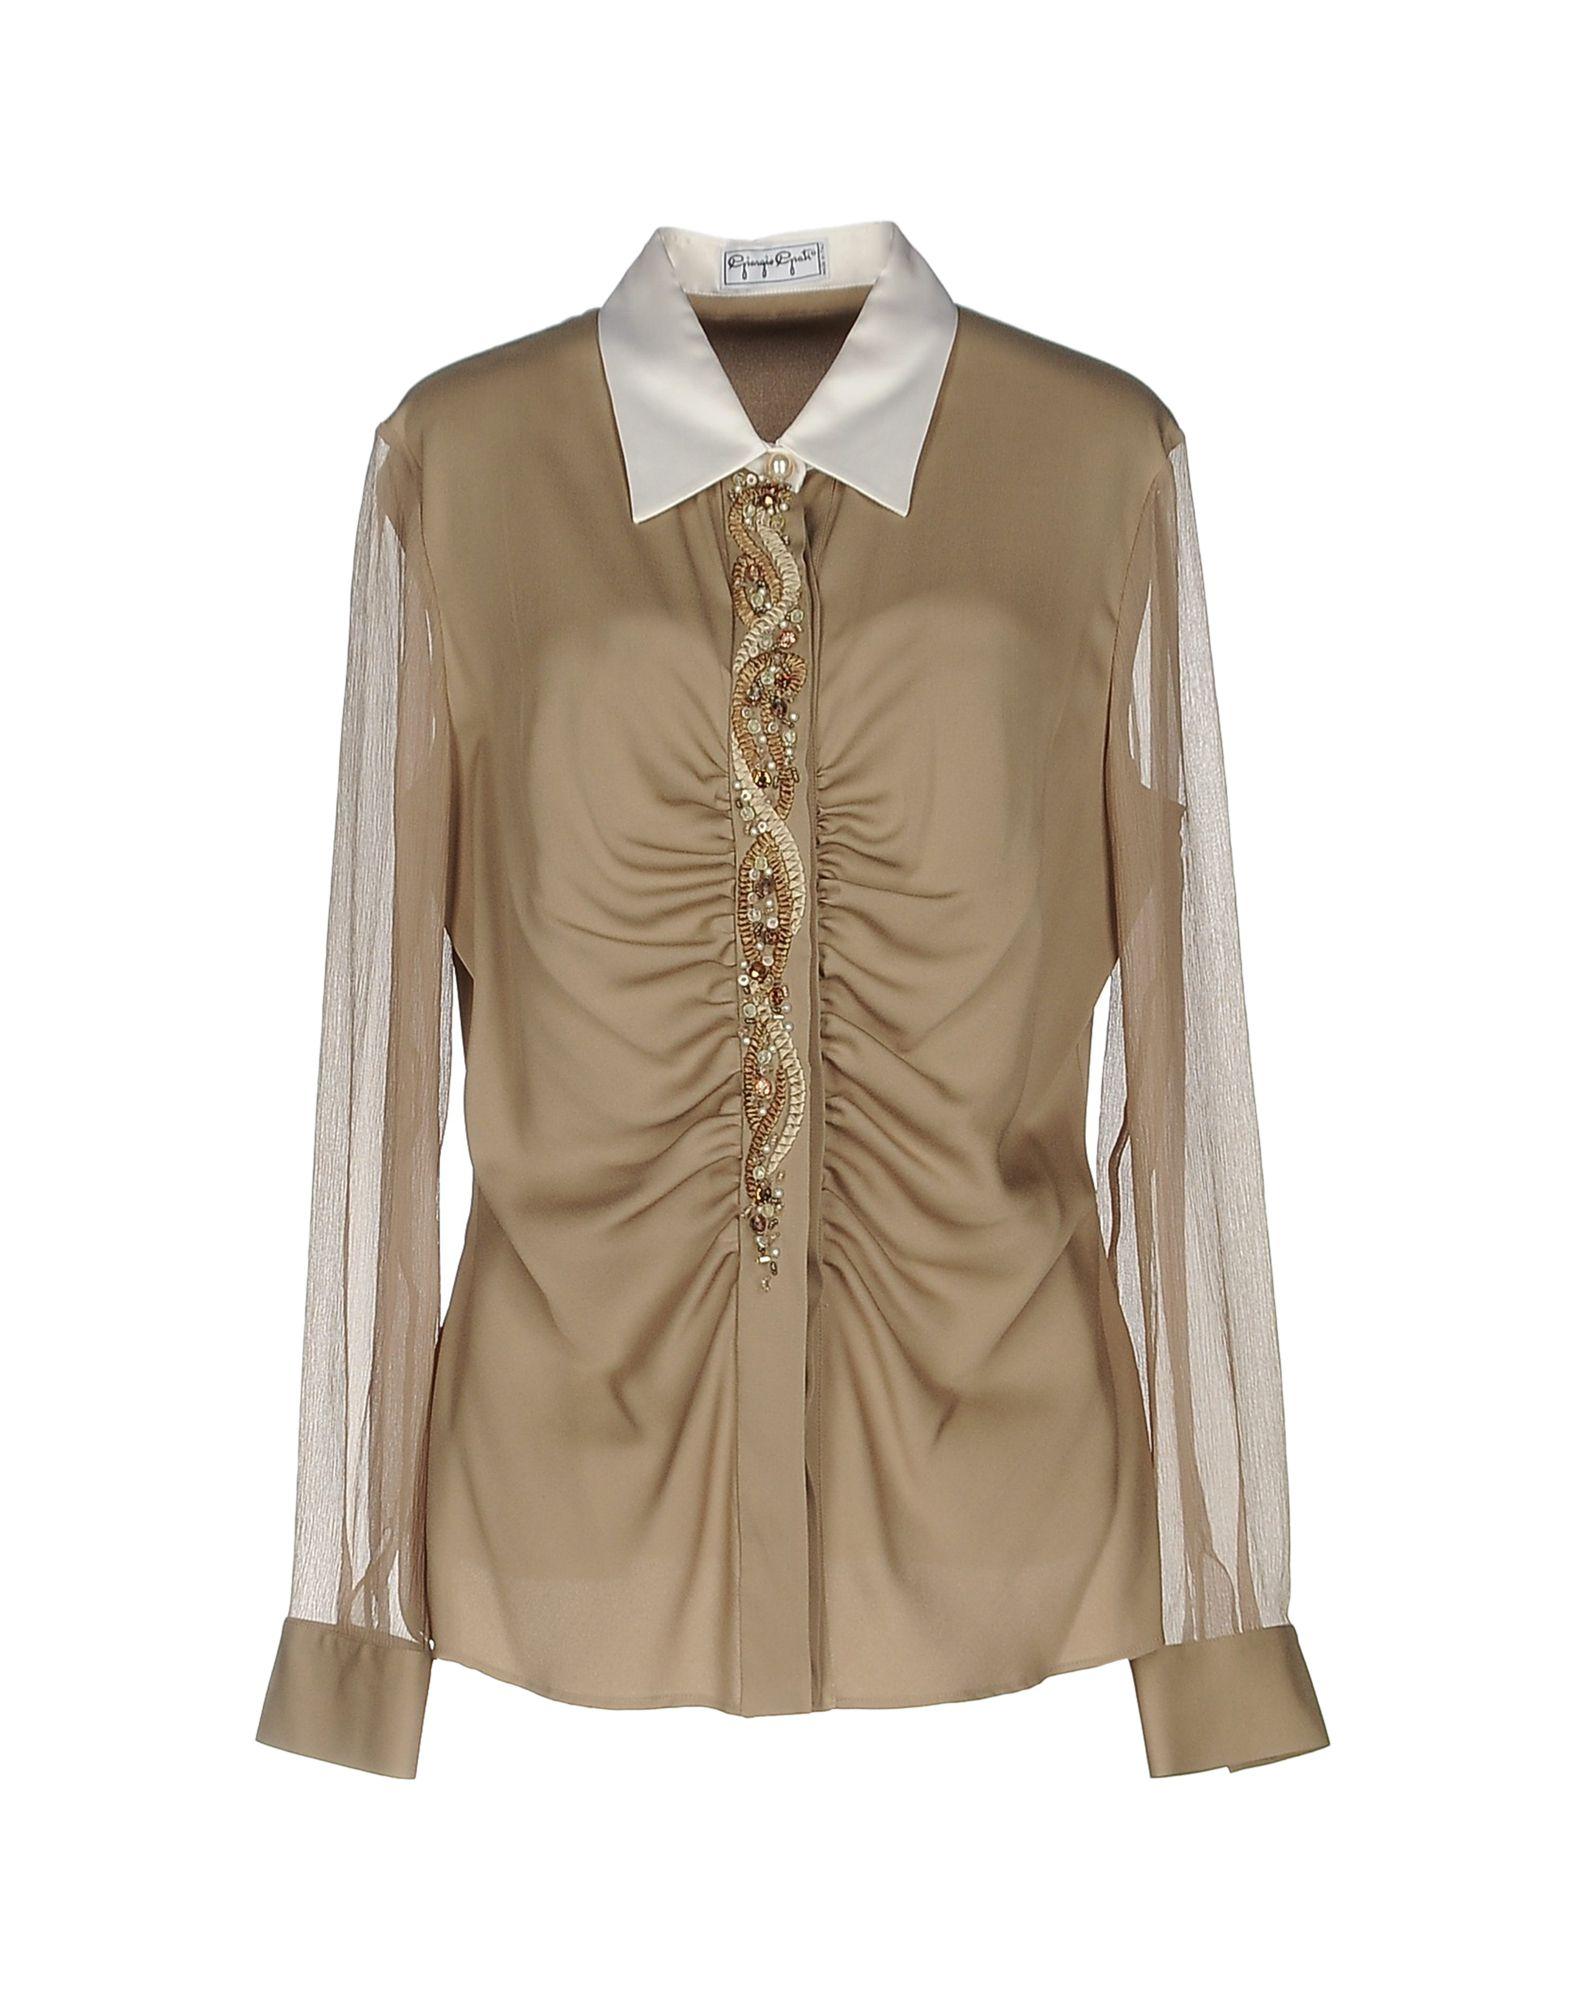 GIORGIO GRATI Damen Hemd Farbe Beige Größe 7